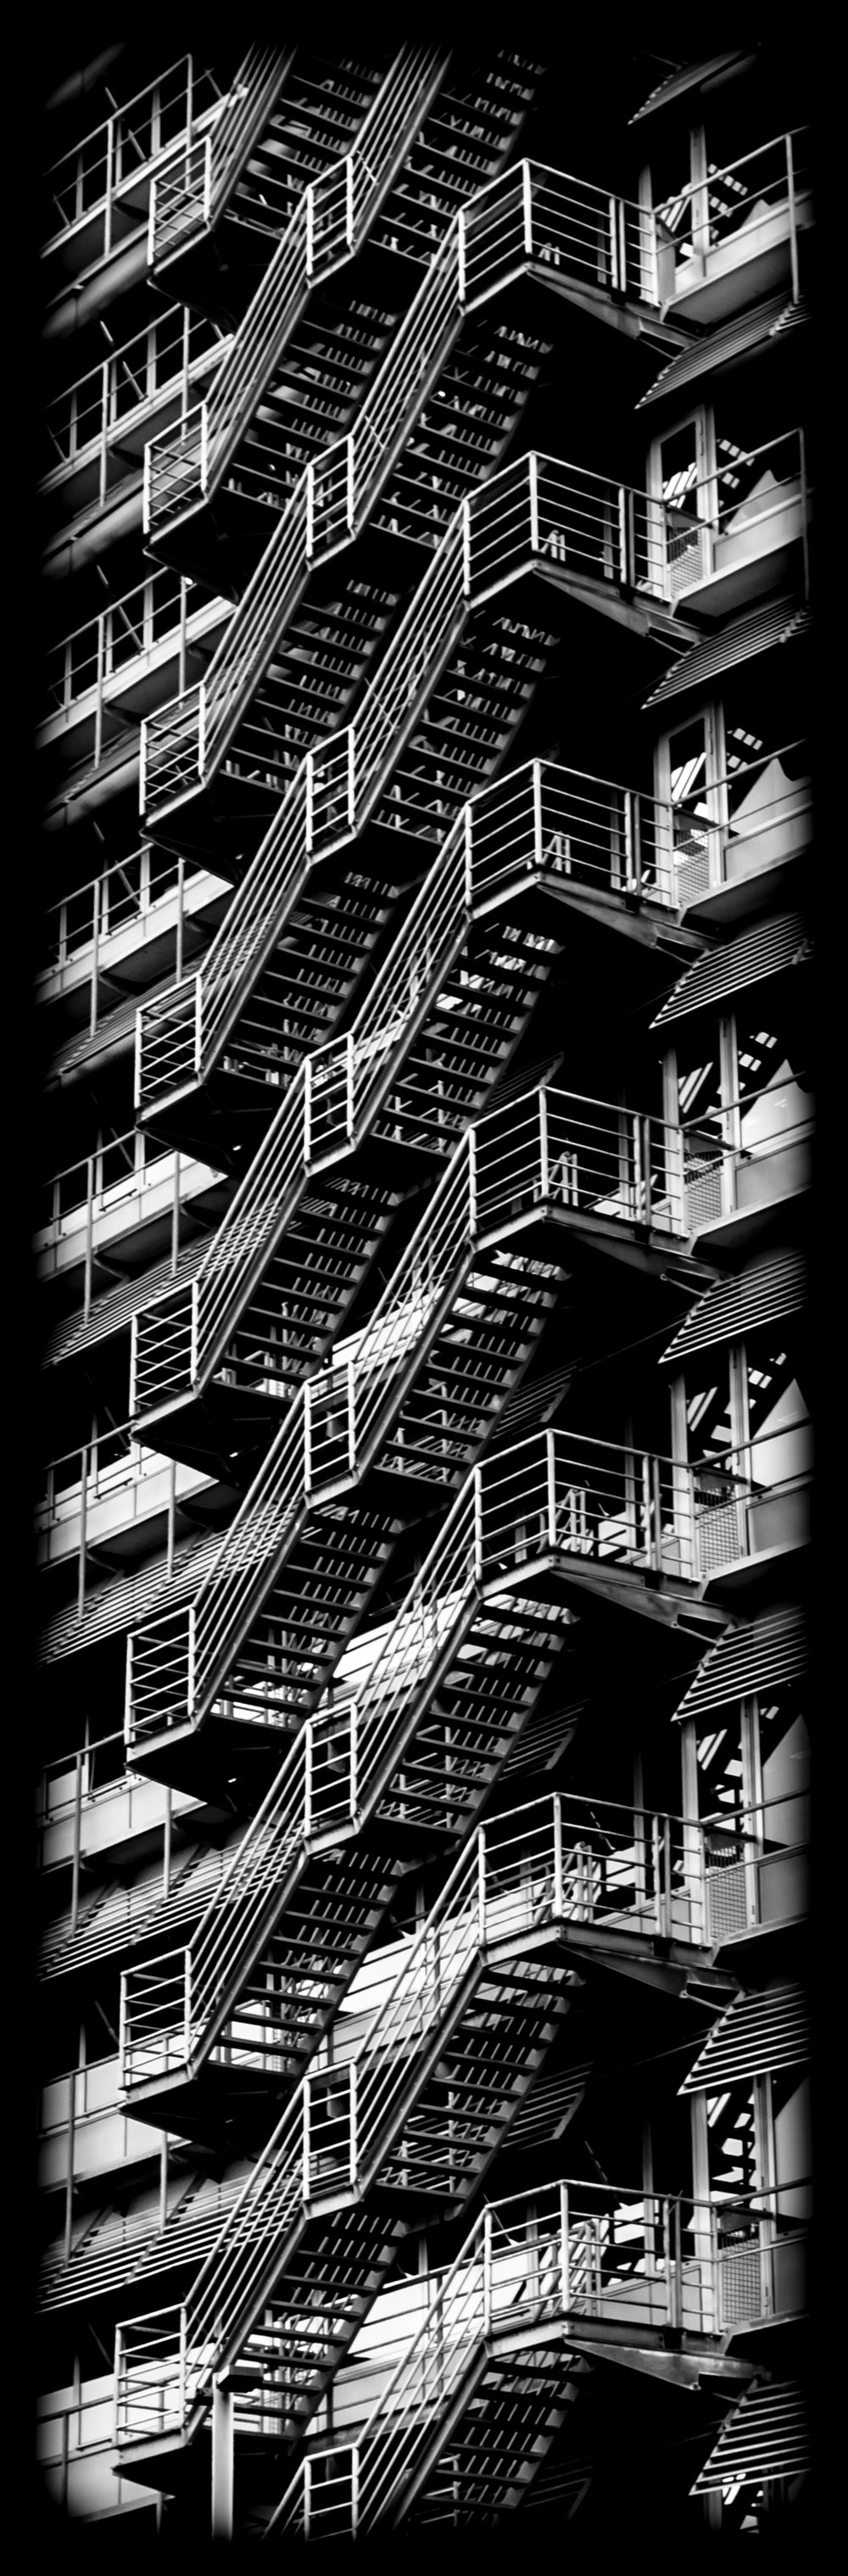 Bart Vos_Stairs5.jpg